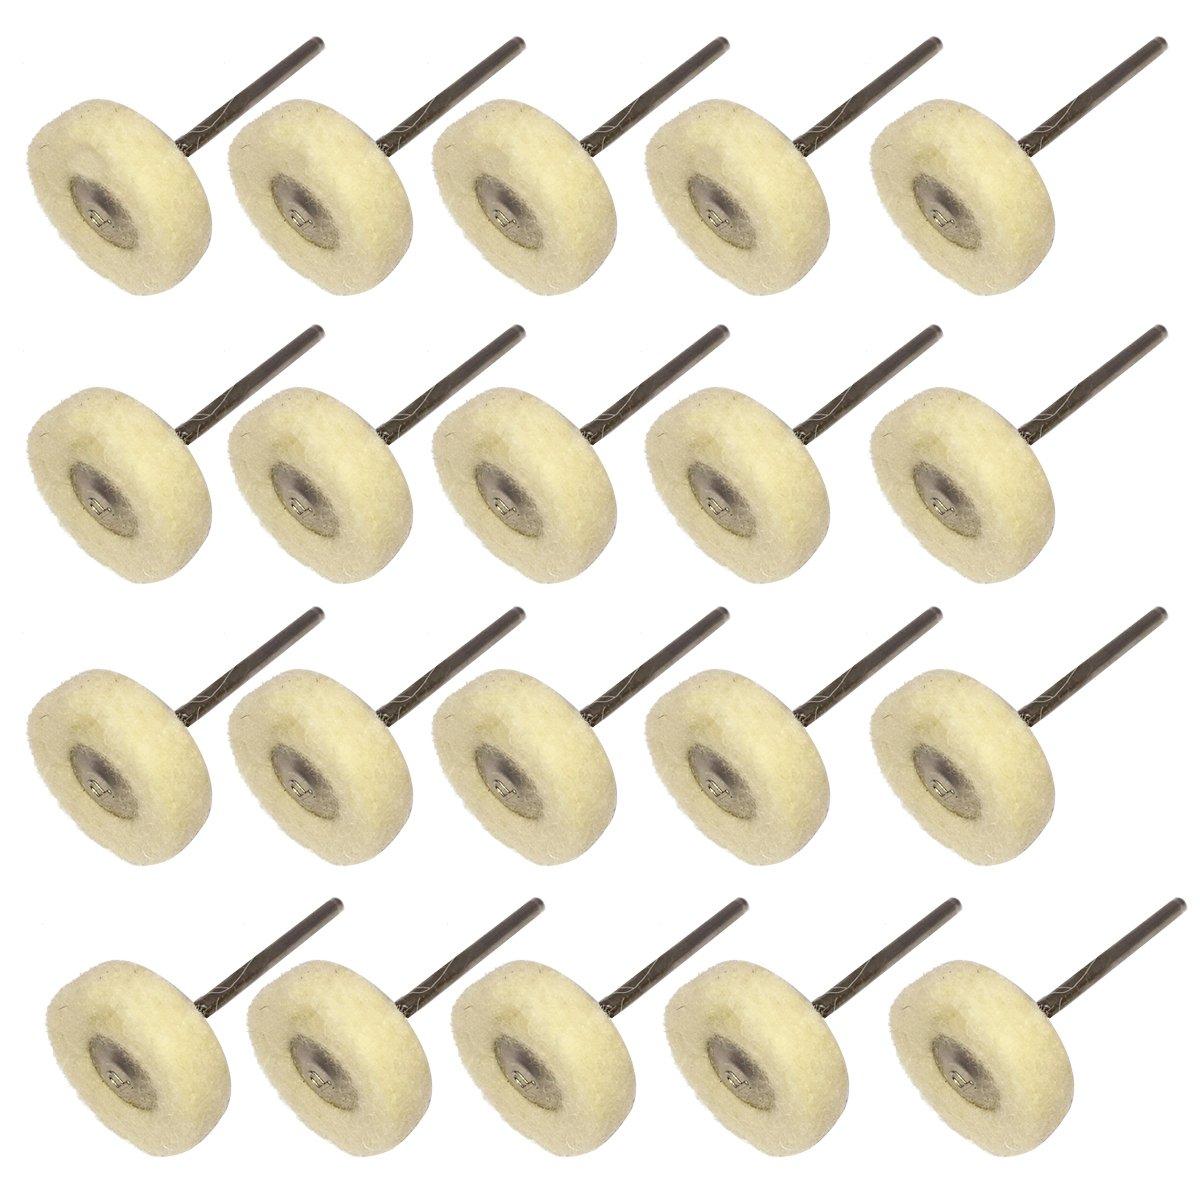 NIUPIKA Mounted Wool Felt Polishing Buff Wheel with Mandrel for Dremel Rotary Tools 2.35mm Shank Pack of 20 NIUPIKA Online NP-44